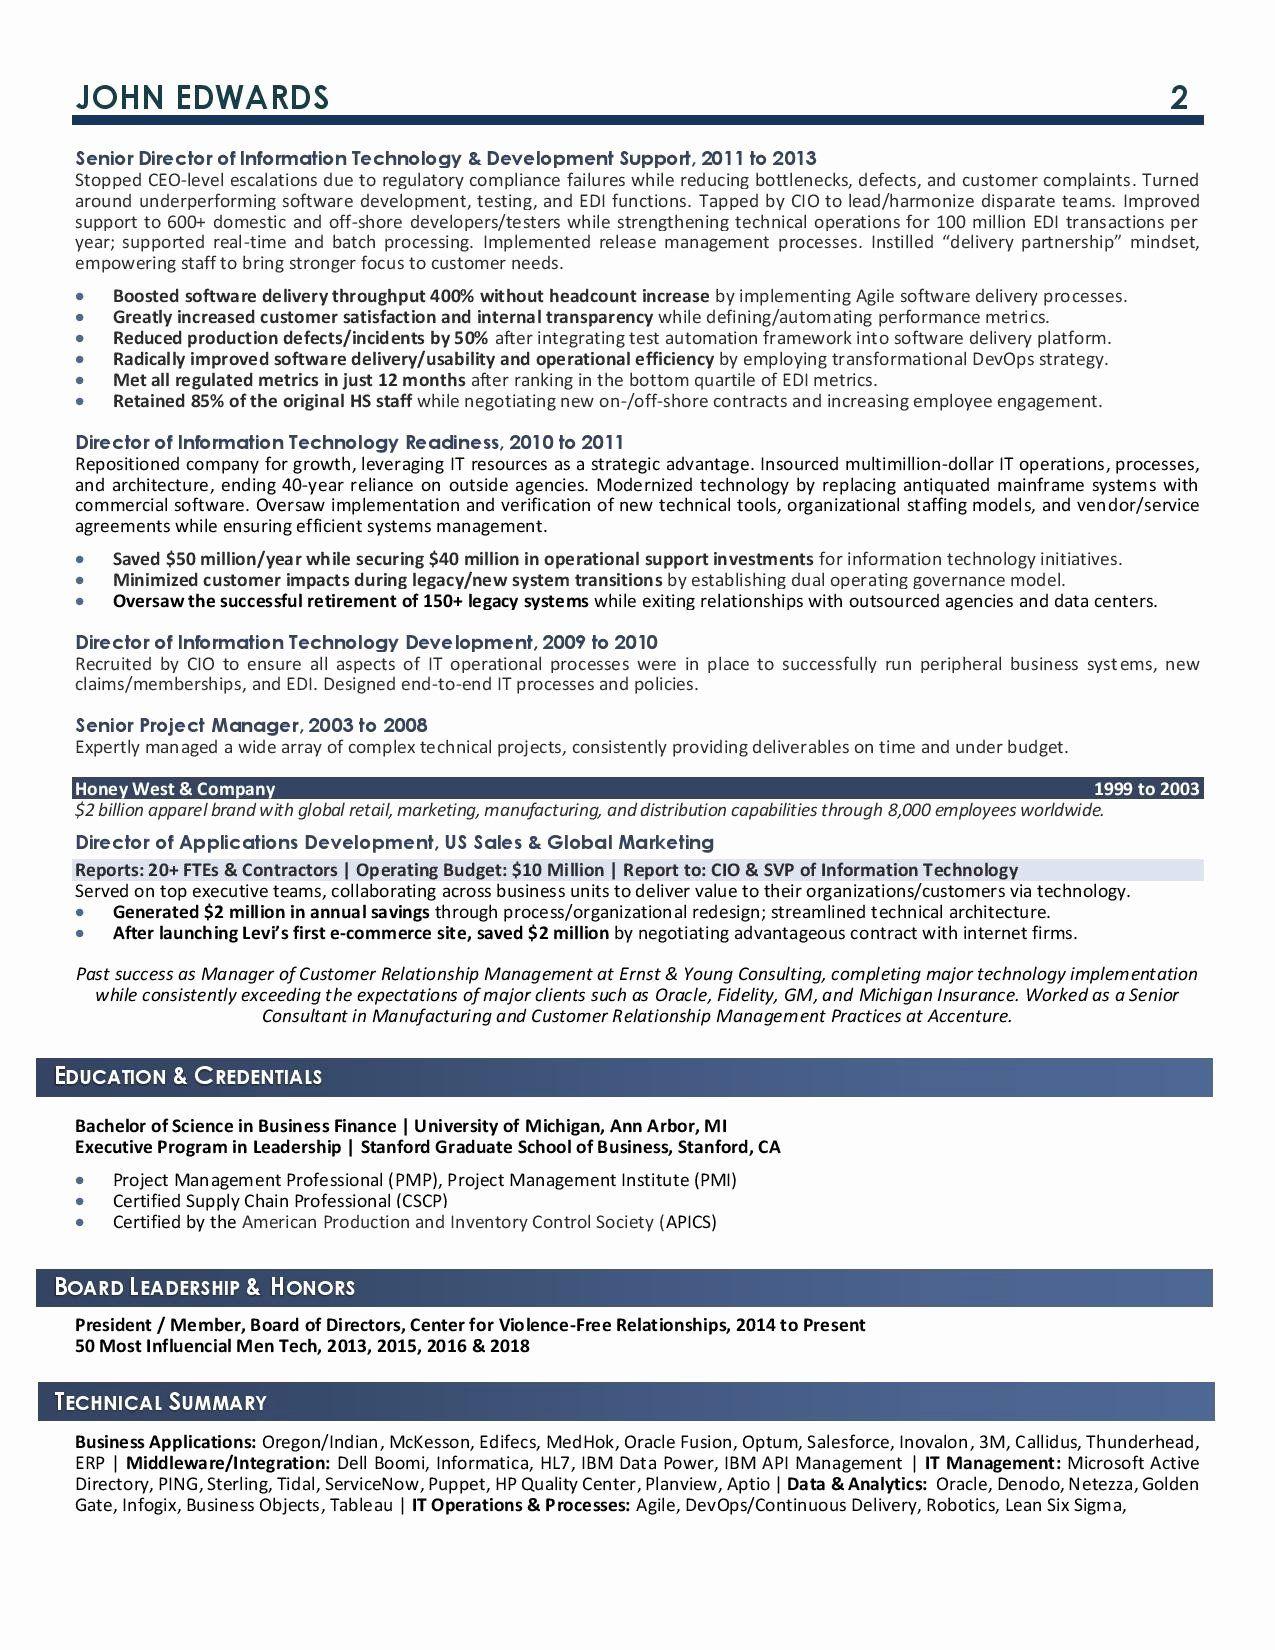 20 Chief Information Officer Resume in 2020 Job resume